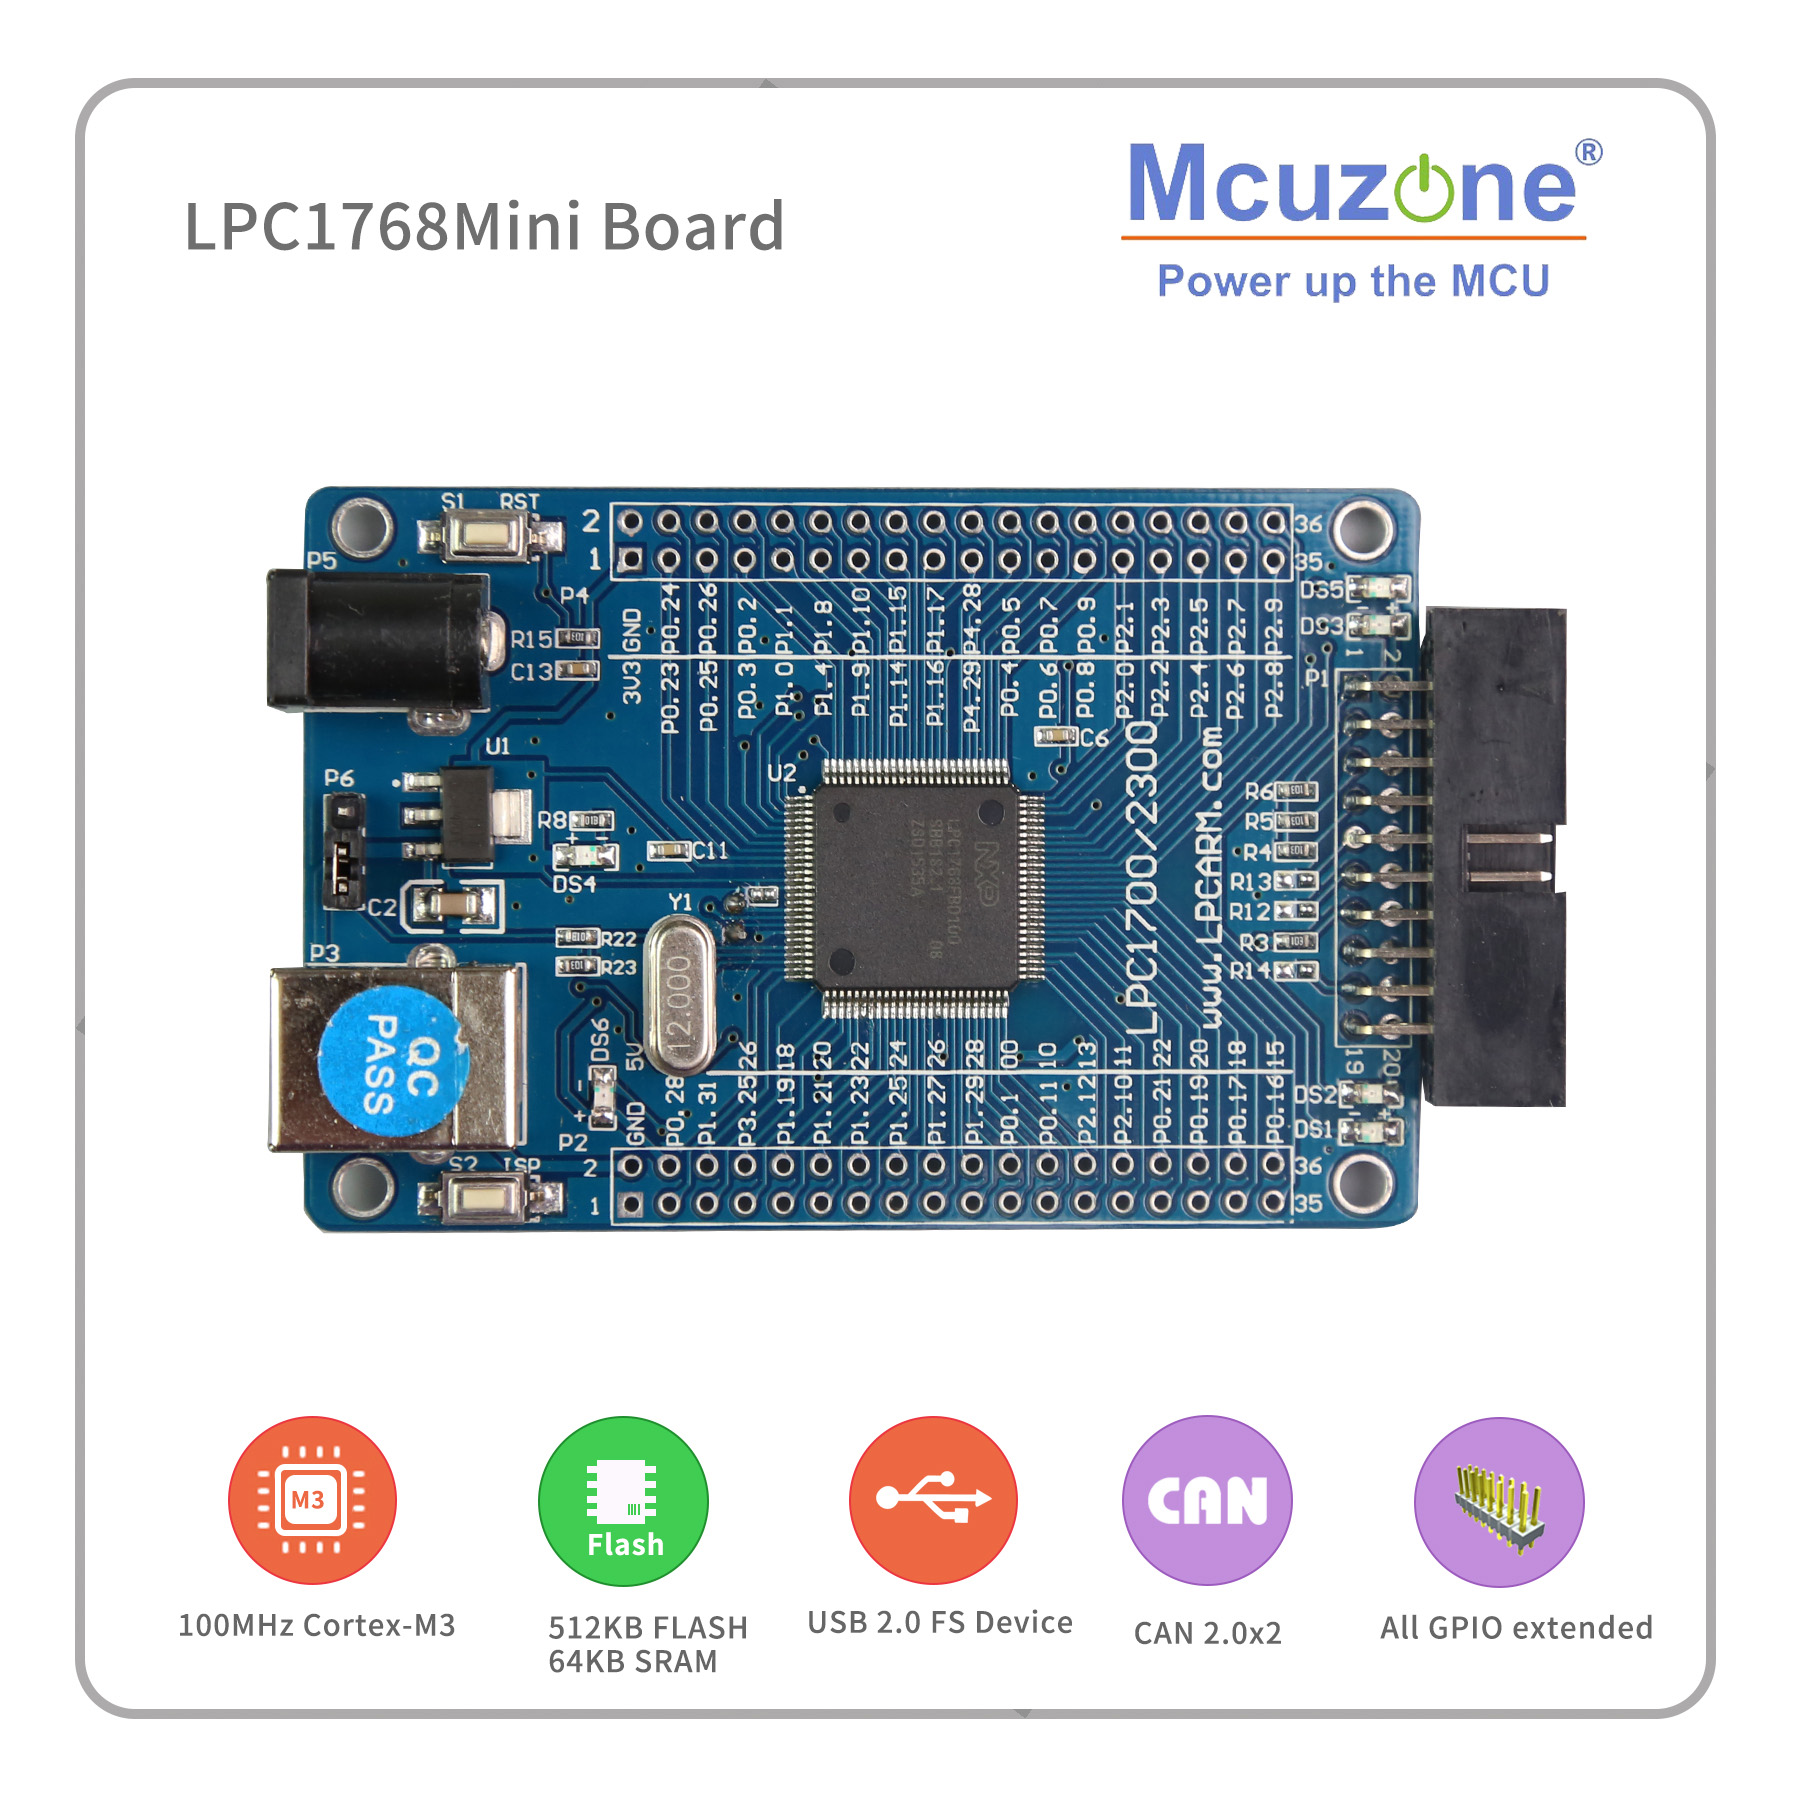 LPC1768 Mini Board  100MHz Cortex-M3, USB, EMAC, UART, SPI, I2C, ADC, DAC, SD NXP GPIO